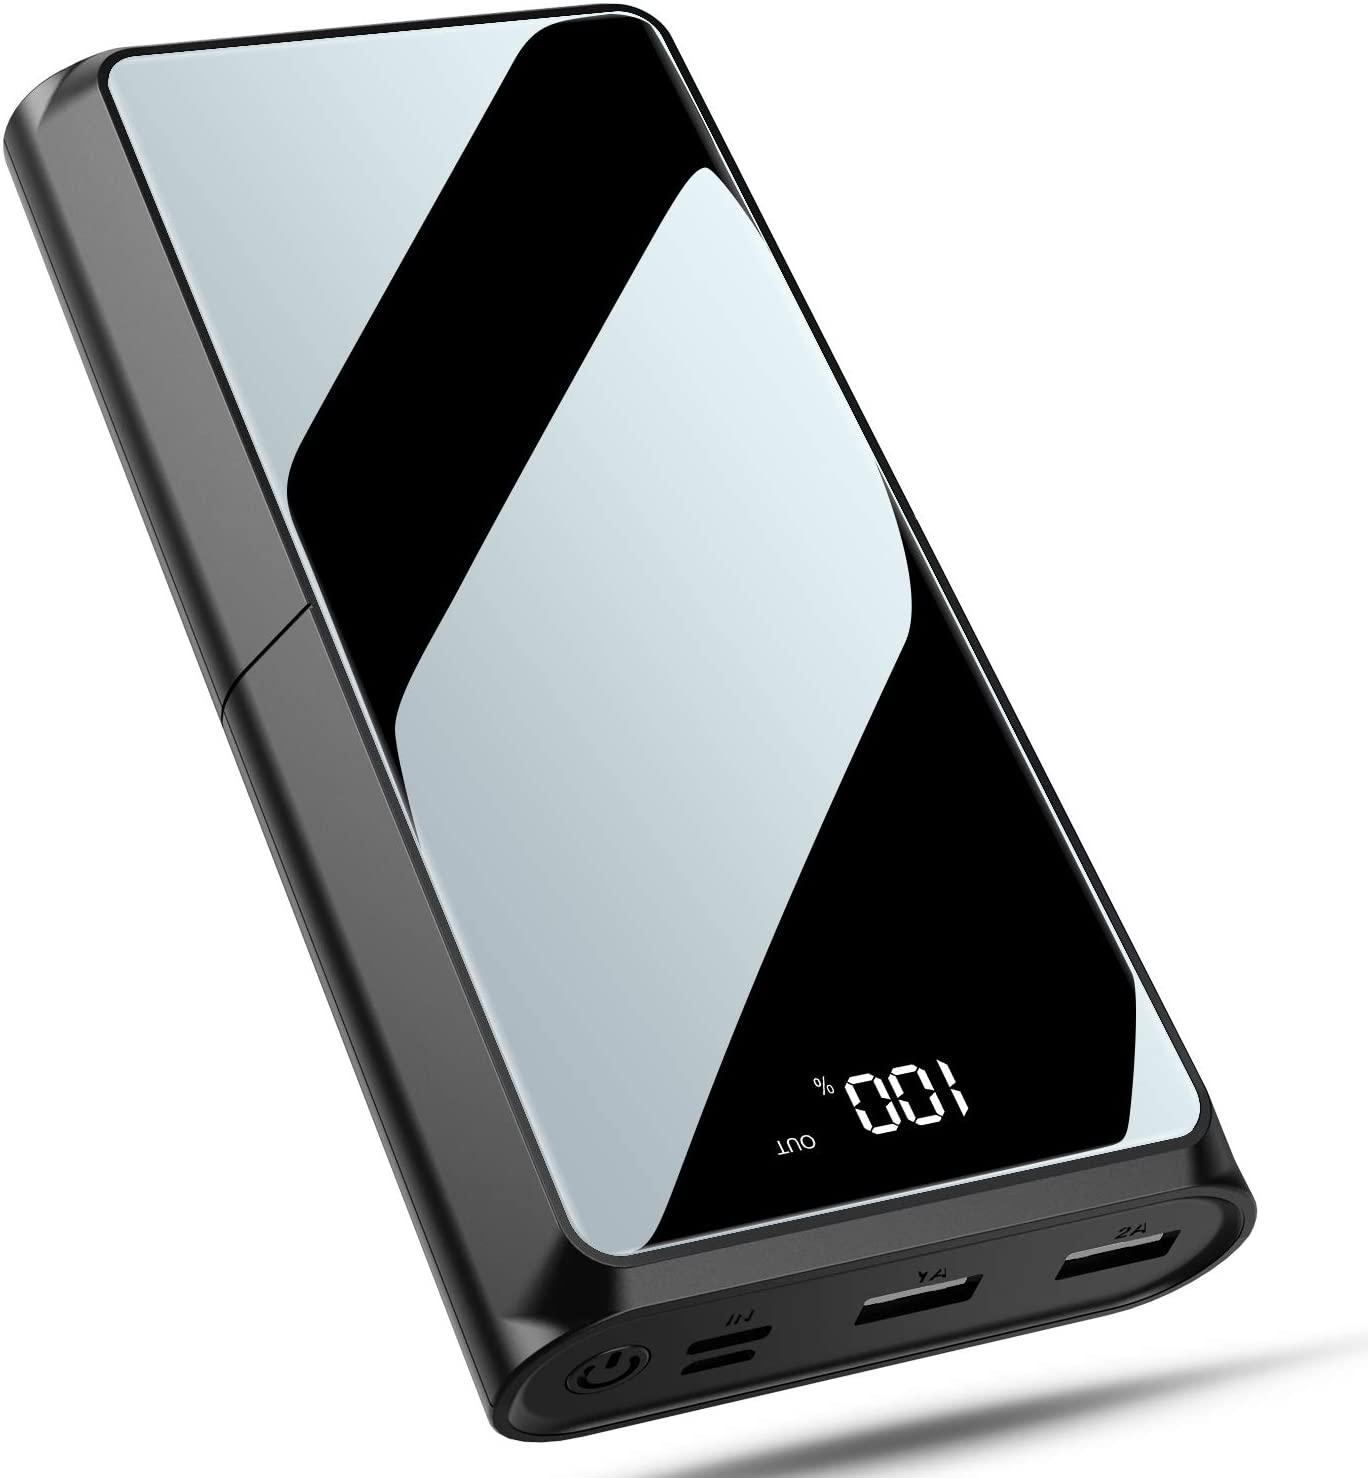 Bewahly Batería Externa 20000mAh, USB C 18W PD Carga Rápida Power Bank Cargador Portátil, Bateria Portatil para Movil con Pantalla LCD, 3 Salida & 2 Entrada para iPhone, Samsung, Huawei y Más - Negro